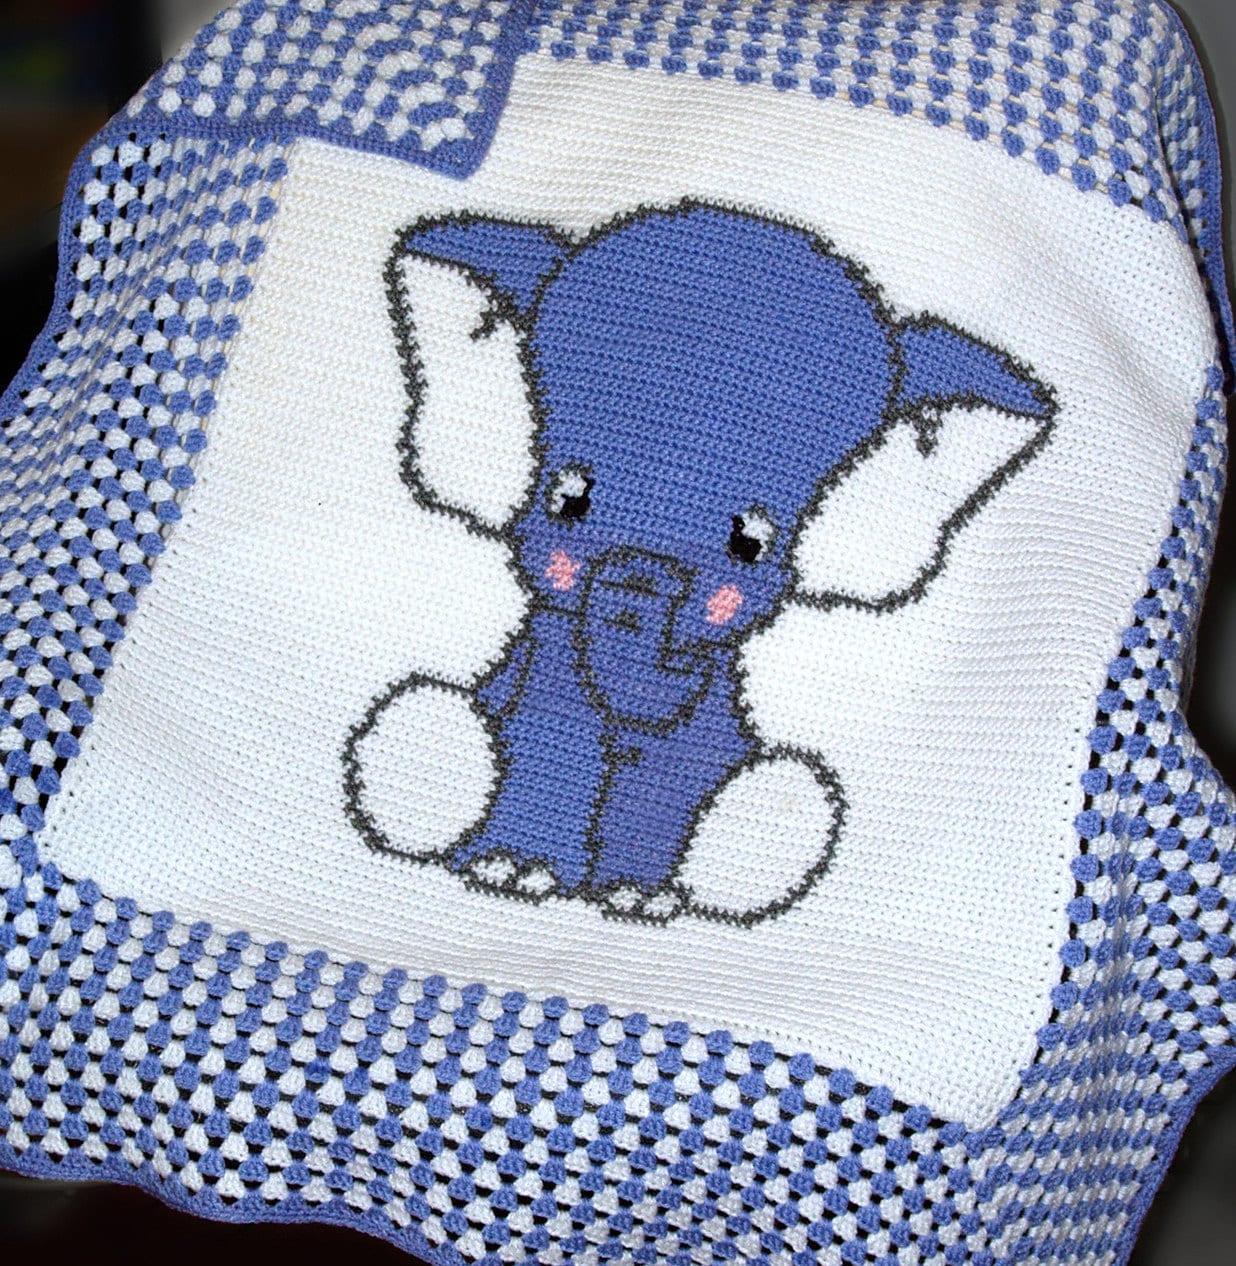 Knitting Pattern Baby Blanket Elephant : CROCHET Pattern Baby Blanket Pattern Elephant Crochet